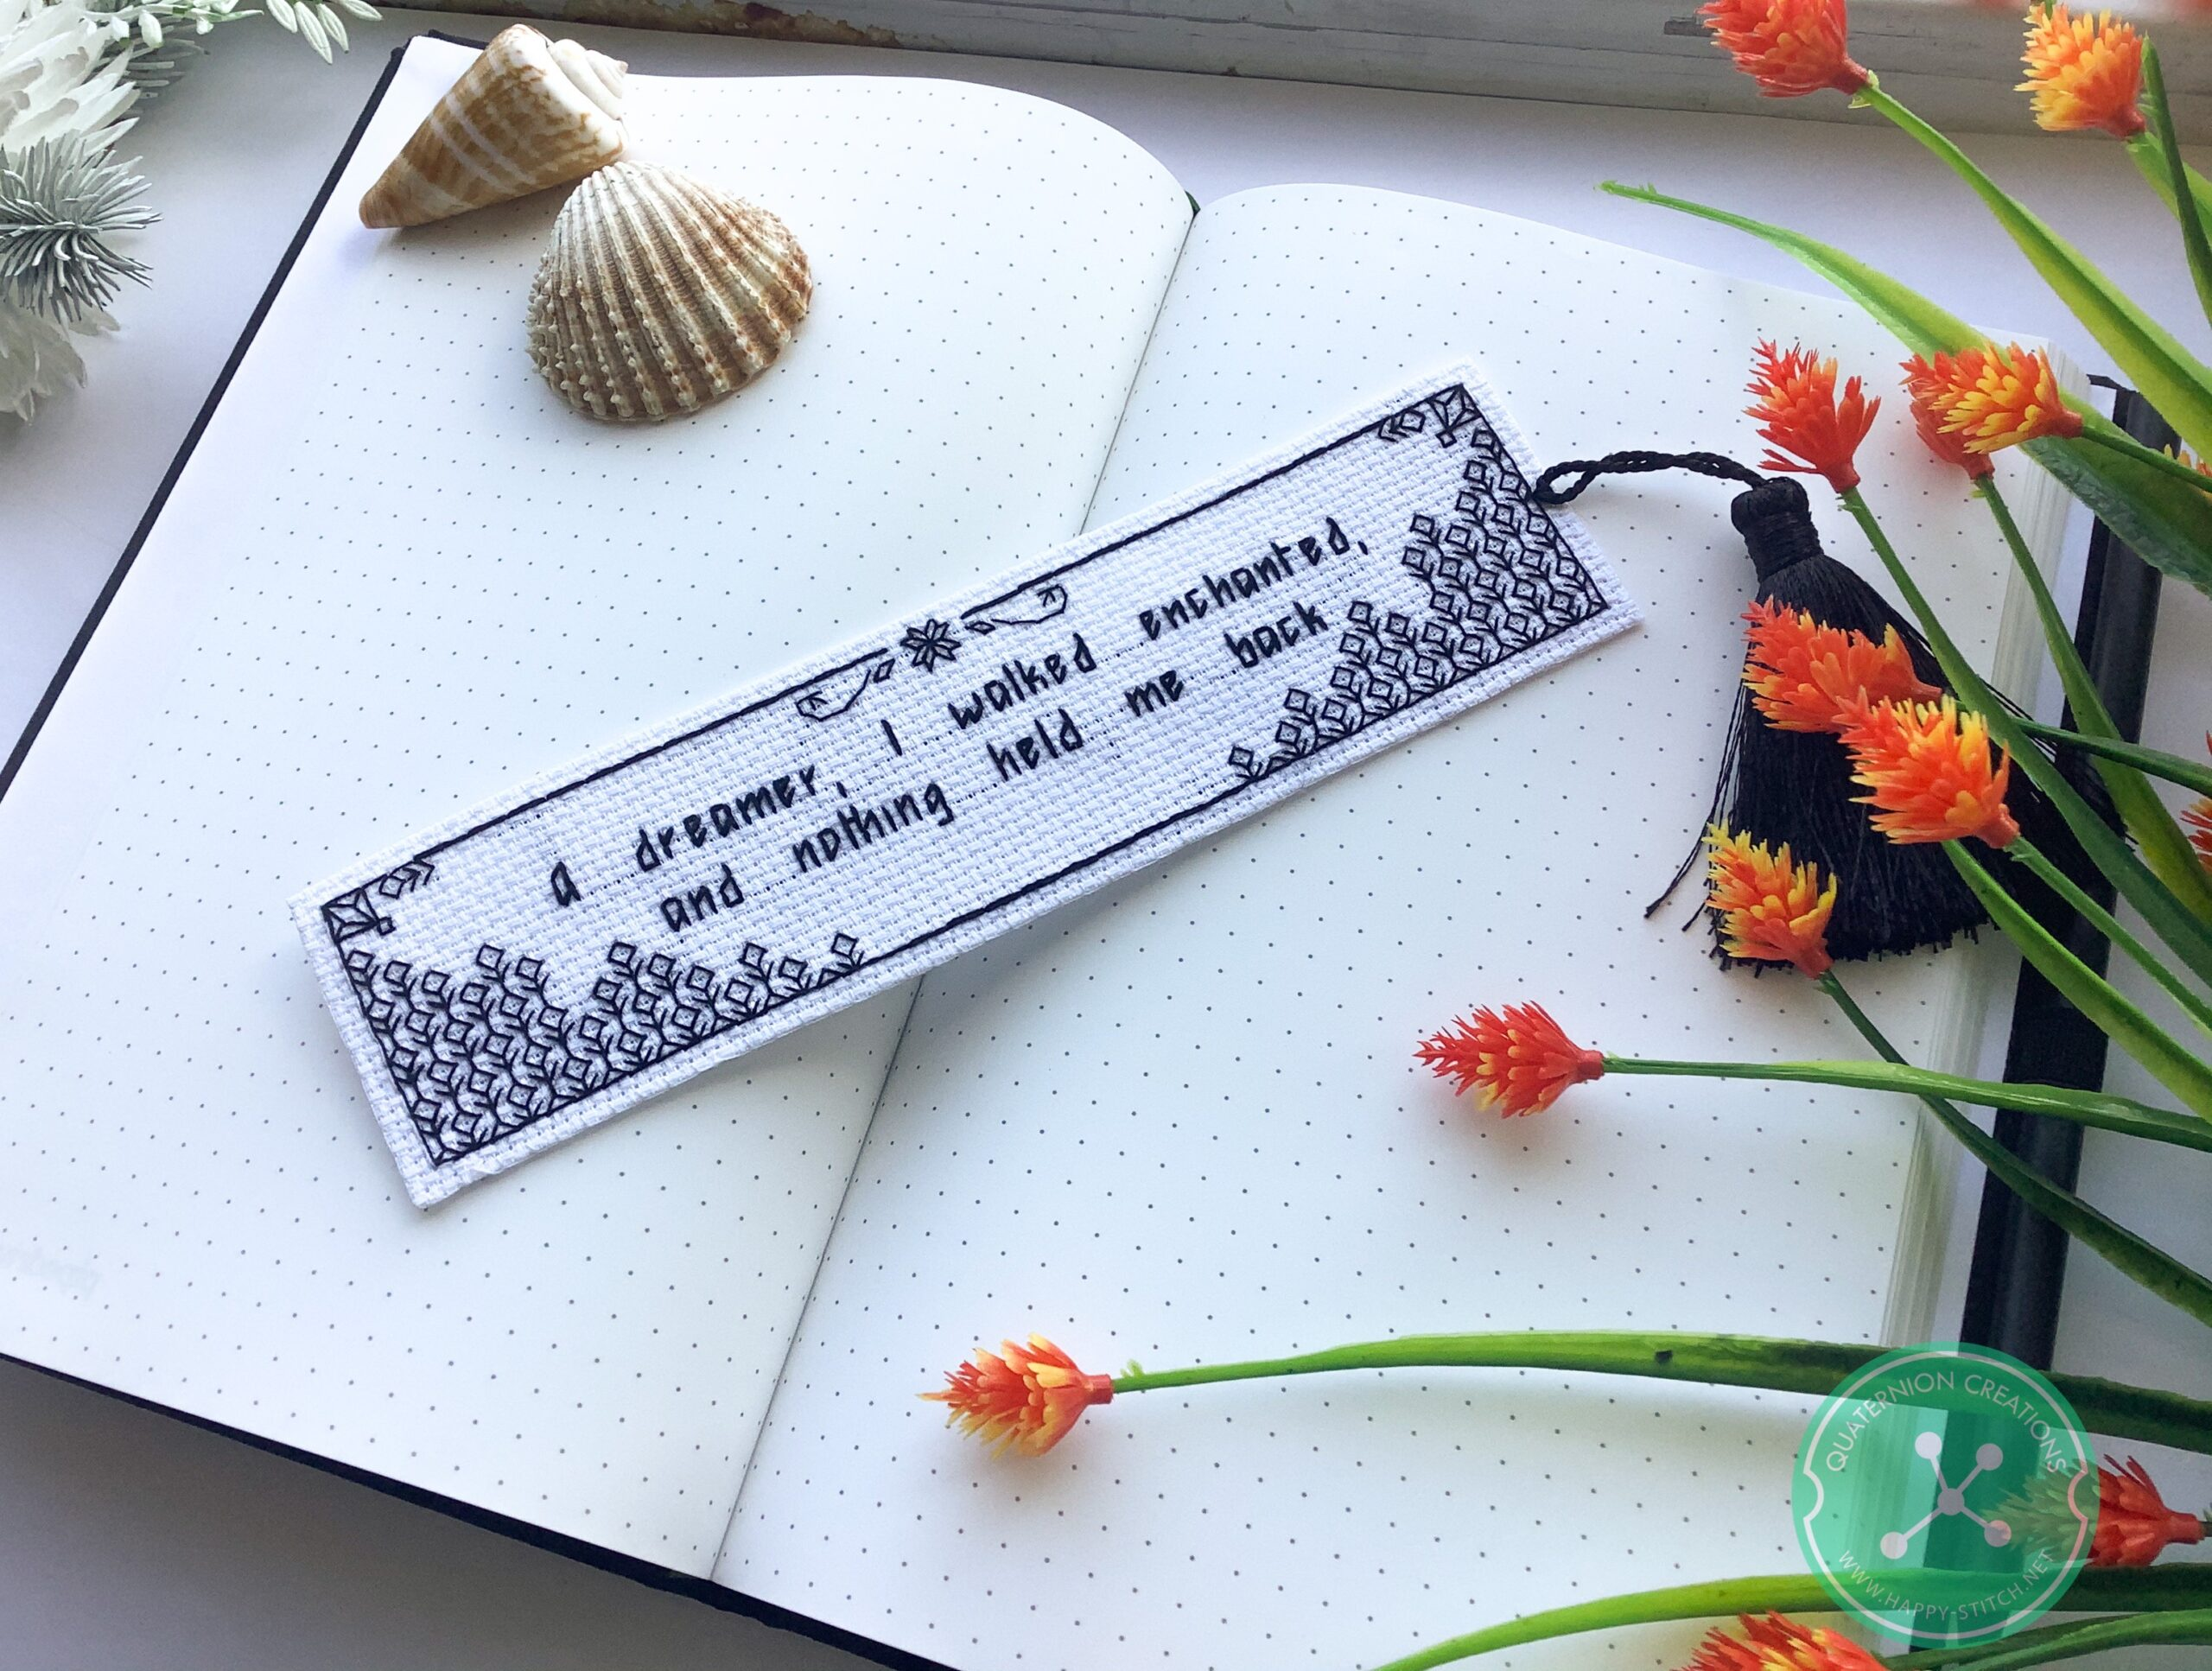 Blackwork bookmarks embroidery pattern